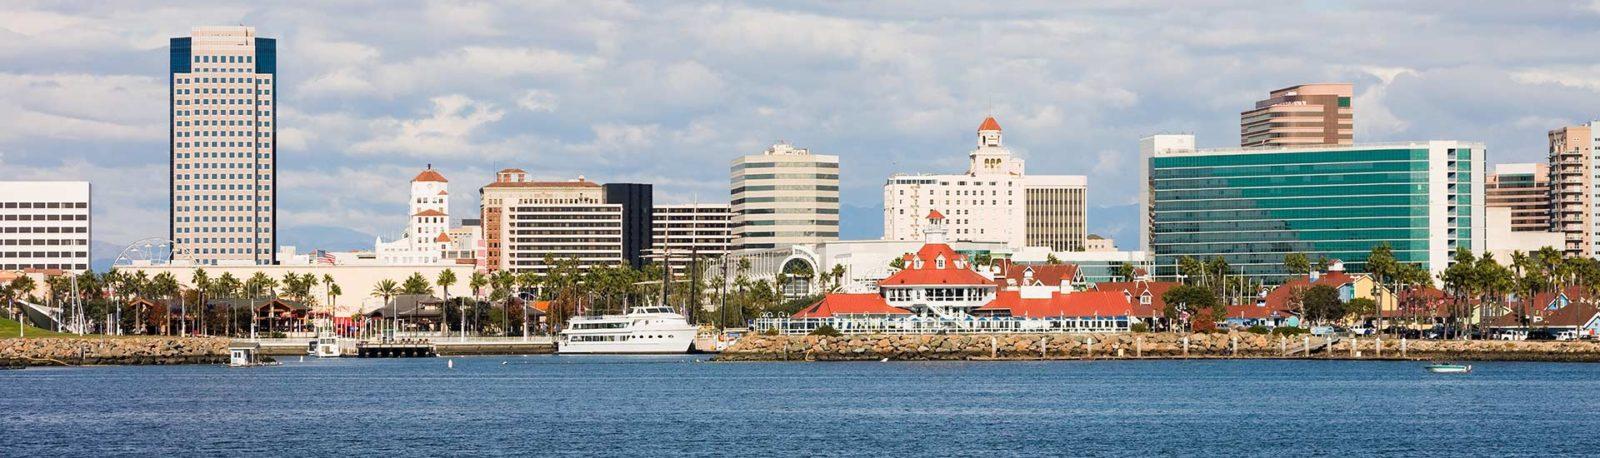 Business Insurance in Long Beach, CA, Anaheim, Cerritos, CA, Huntington Beach